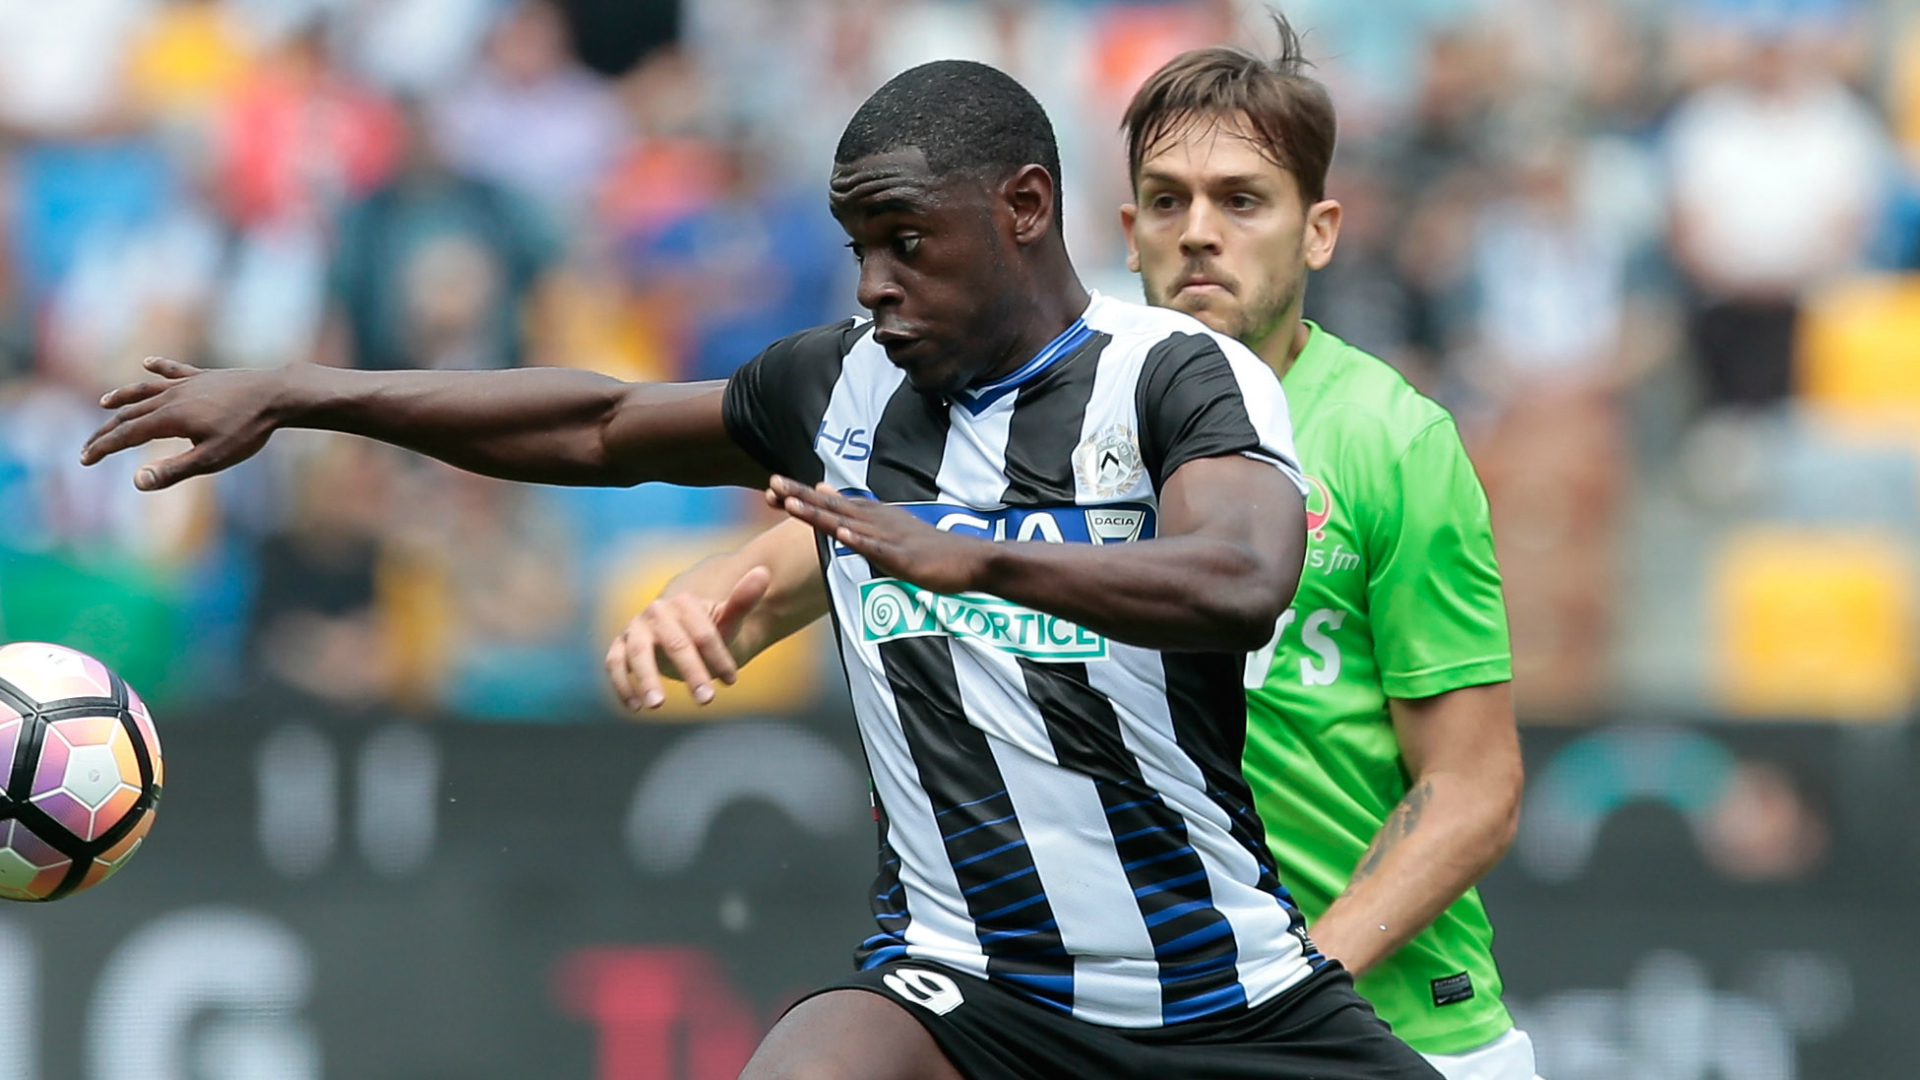 Calcio: Udinese, presentato ds Gerolin